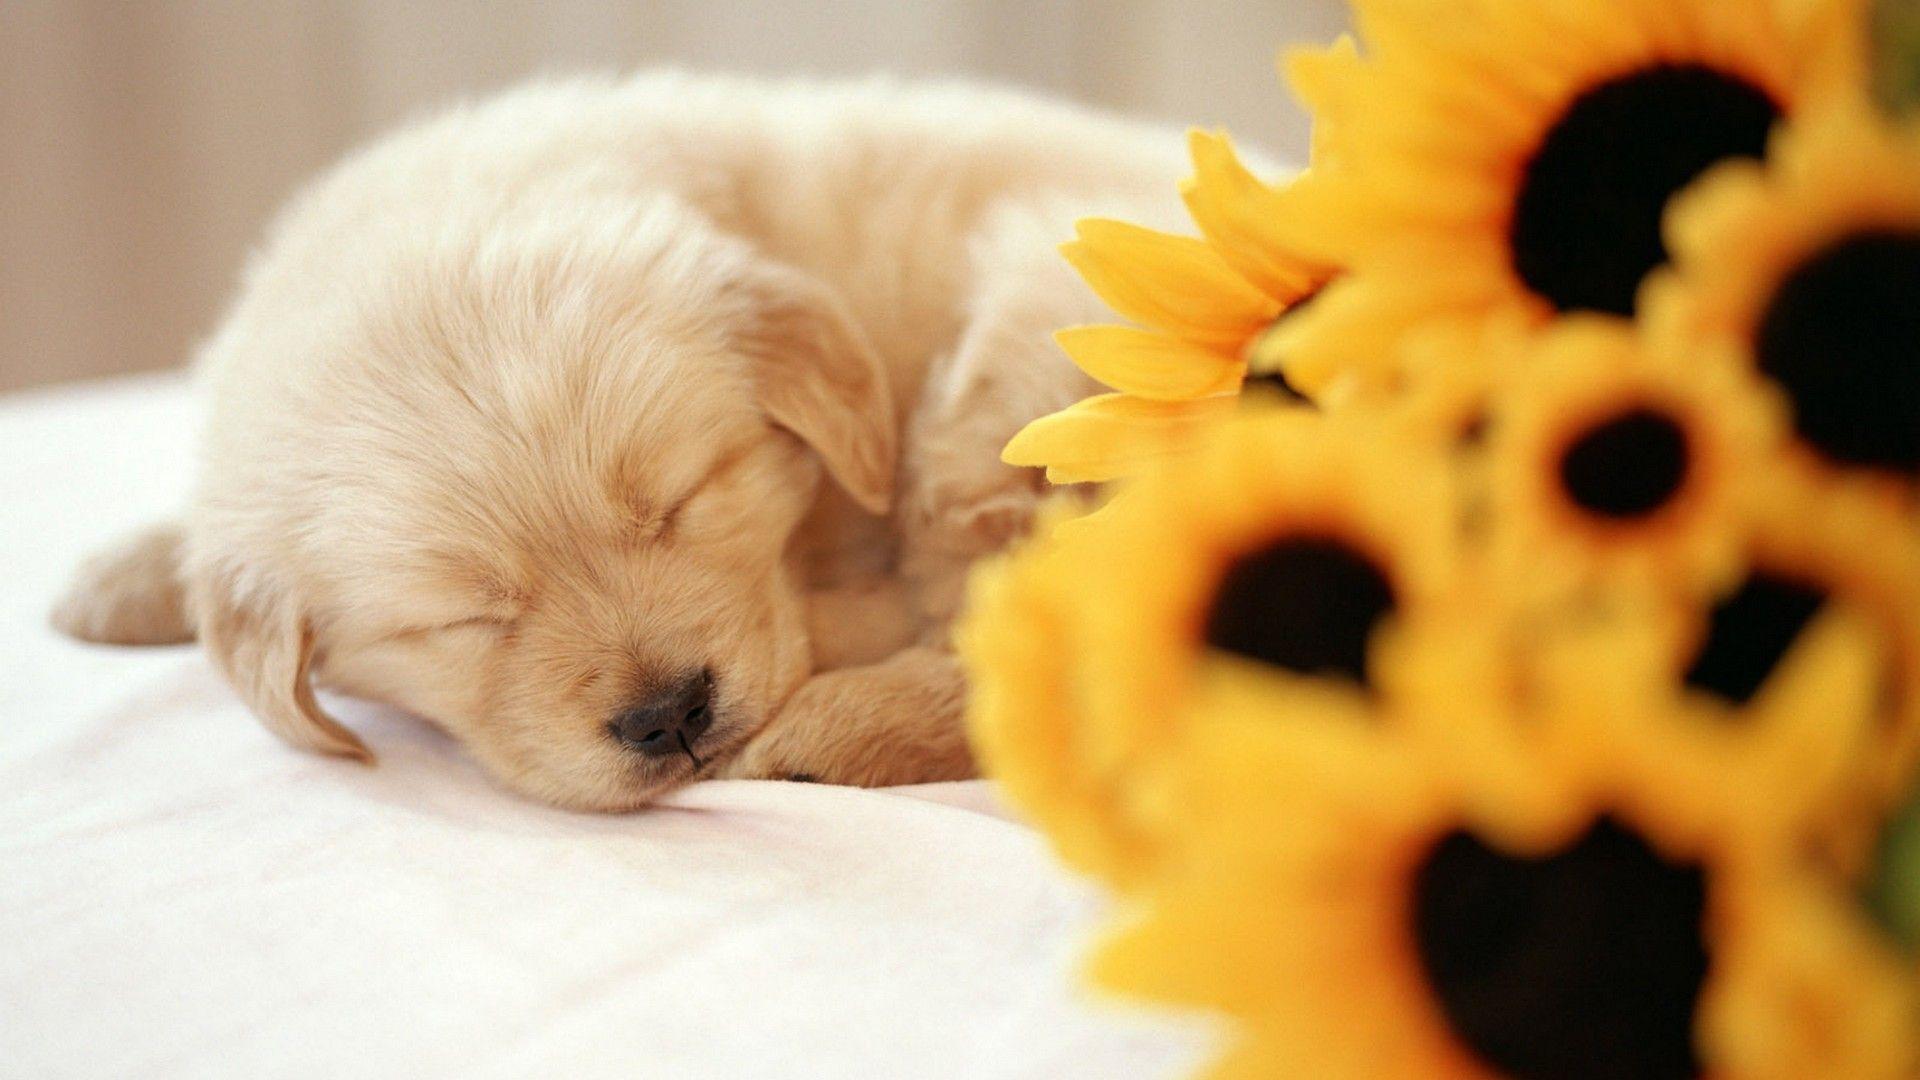 Wallpaper Cute Puppies Desktop Best Hd Wallpapers Puppy Wallpaper Puppy Backgrounds Sleeping Puppies